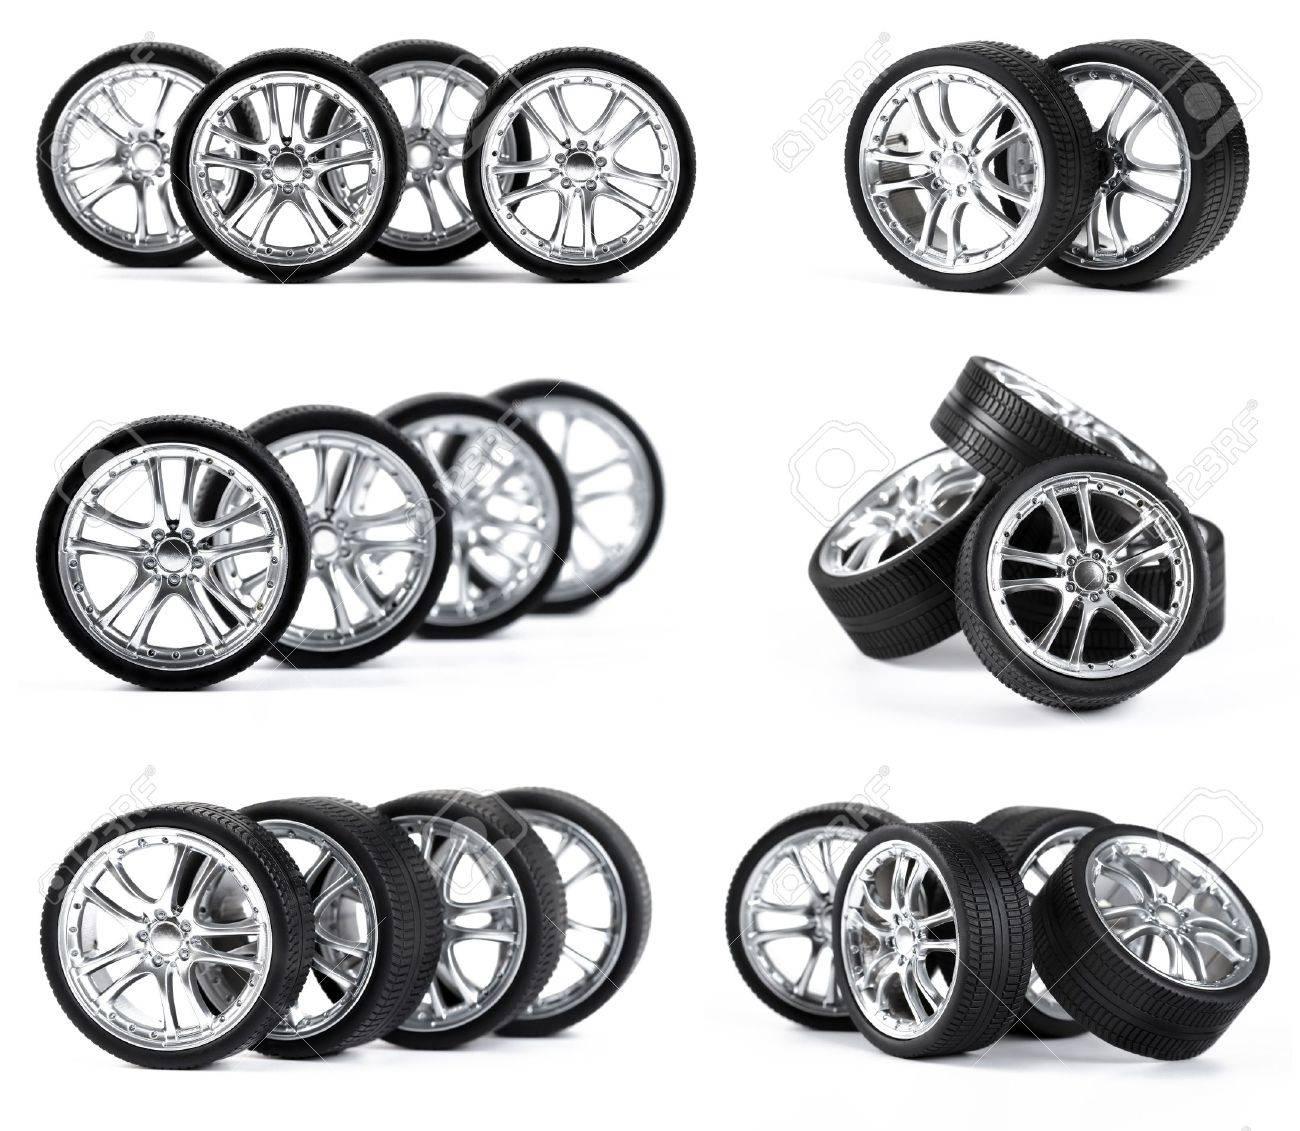 Car wheels on white background. Stock Photo - 11065617